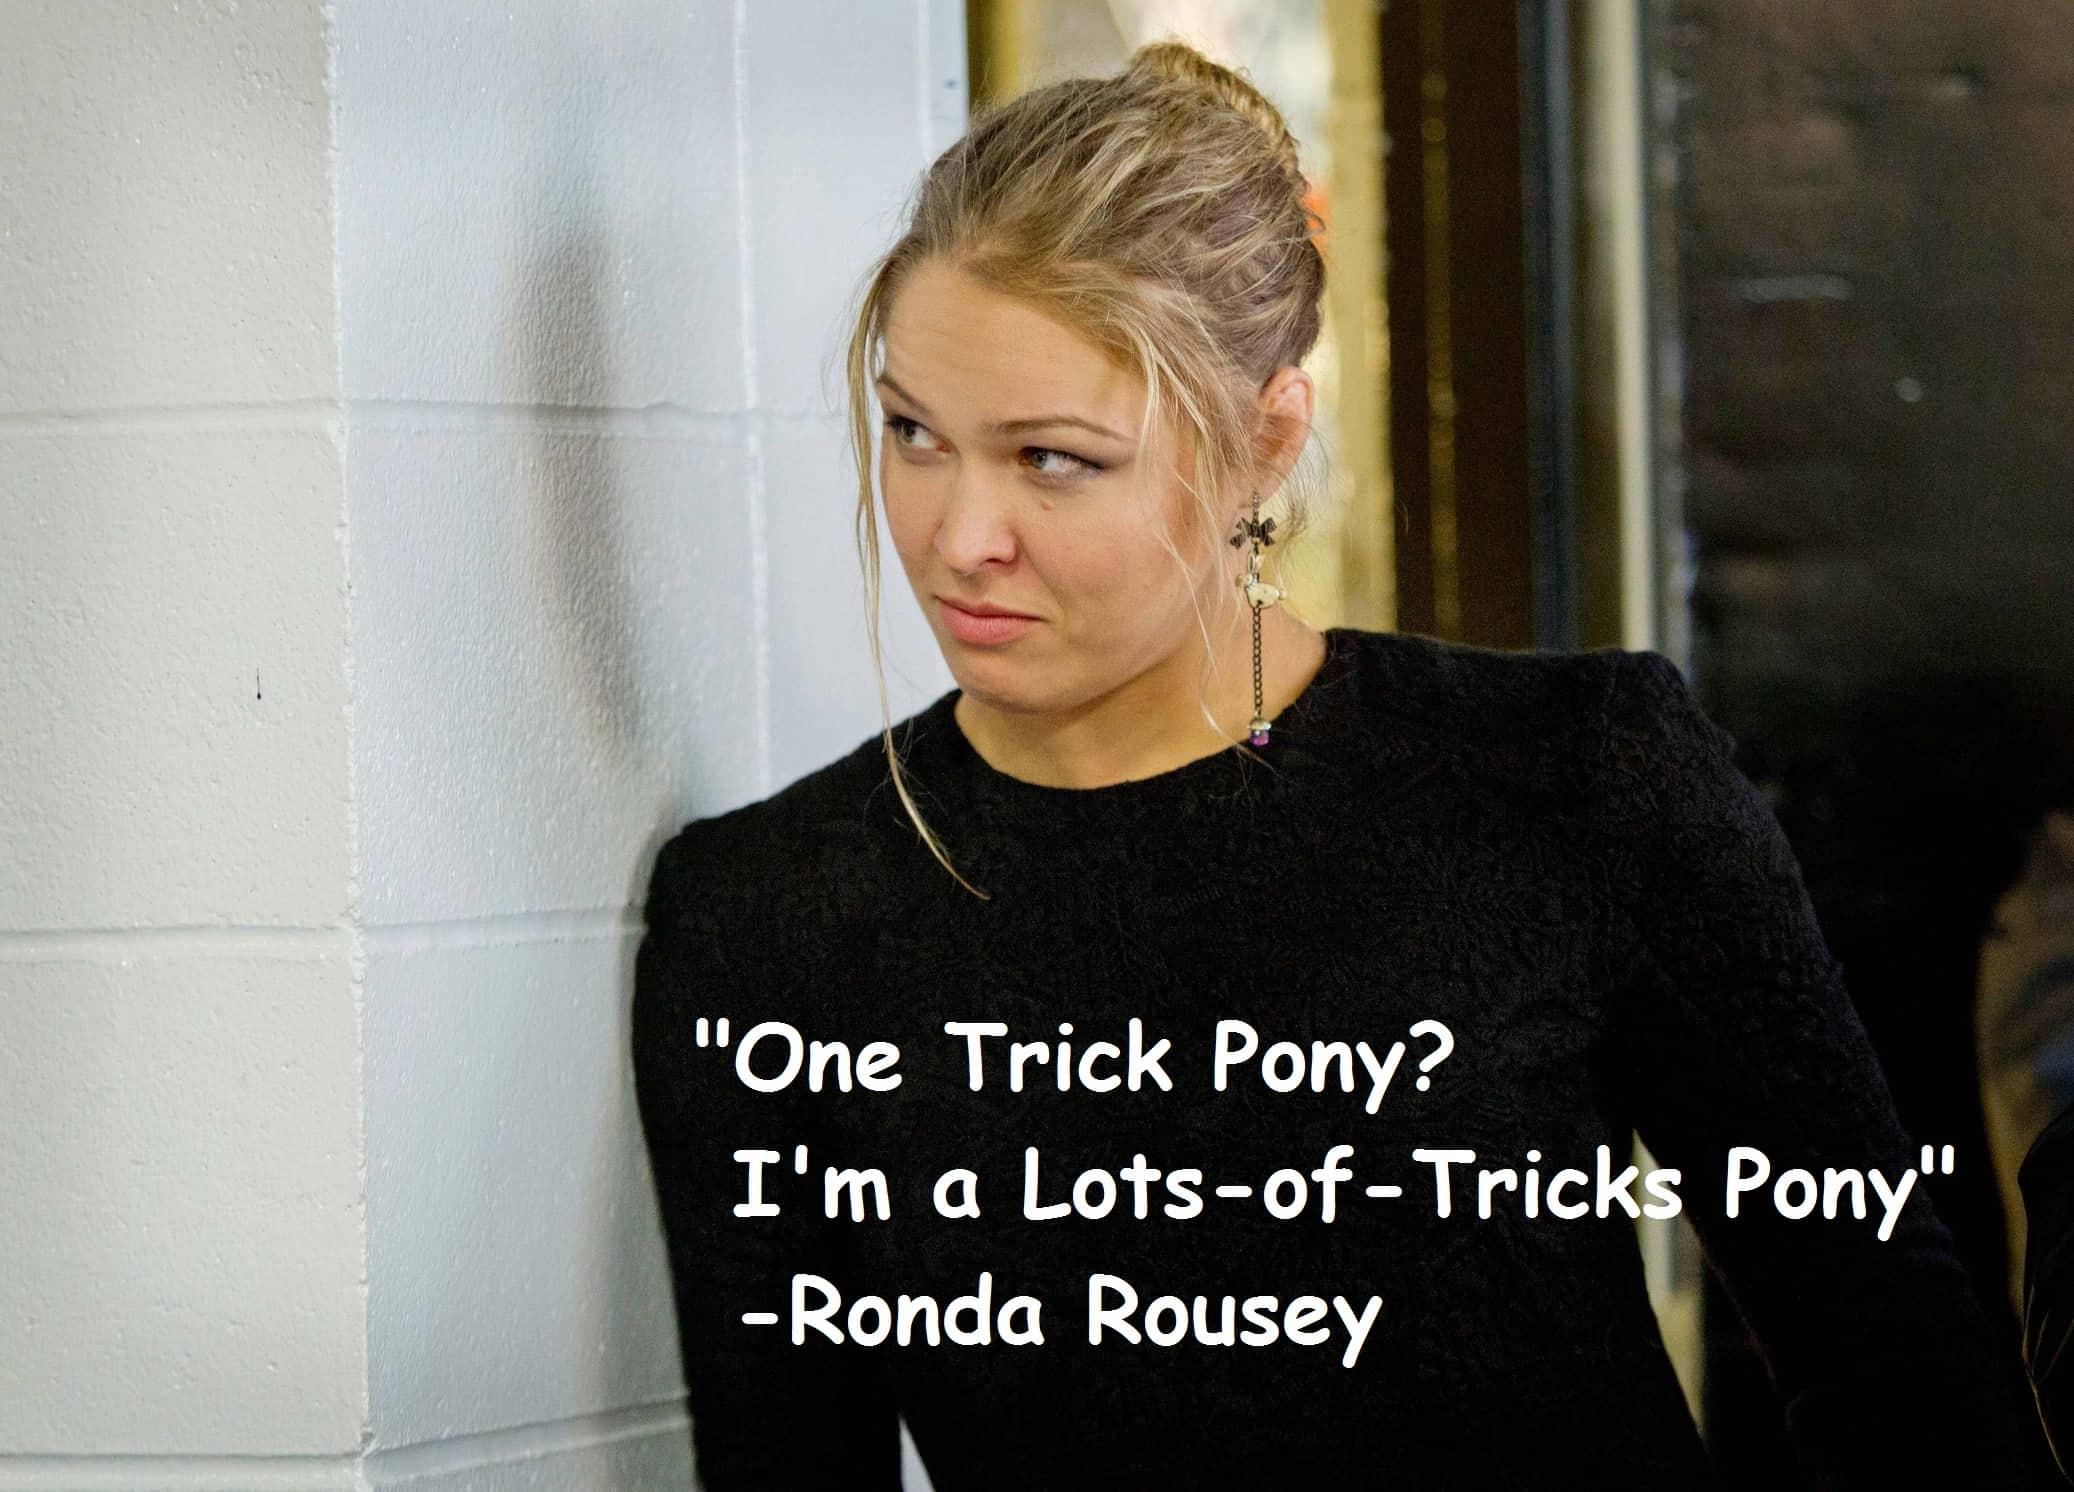 Ronda Rousey Black Dress